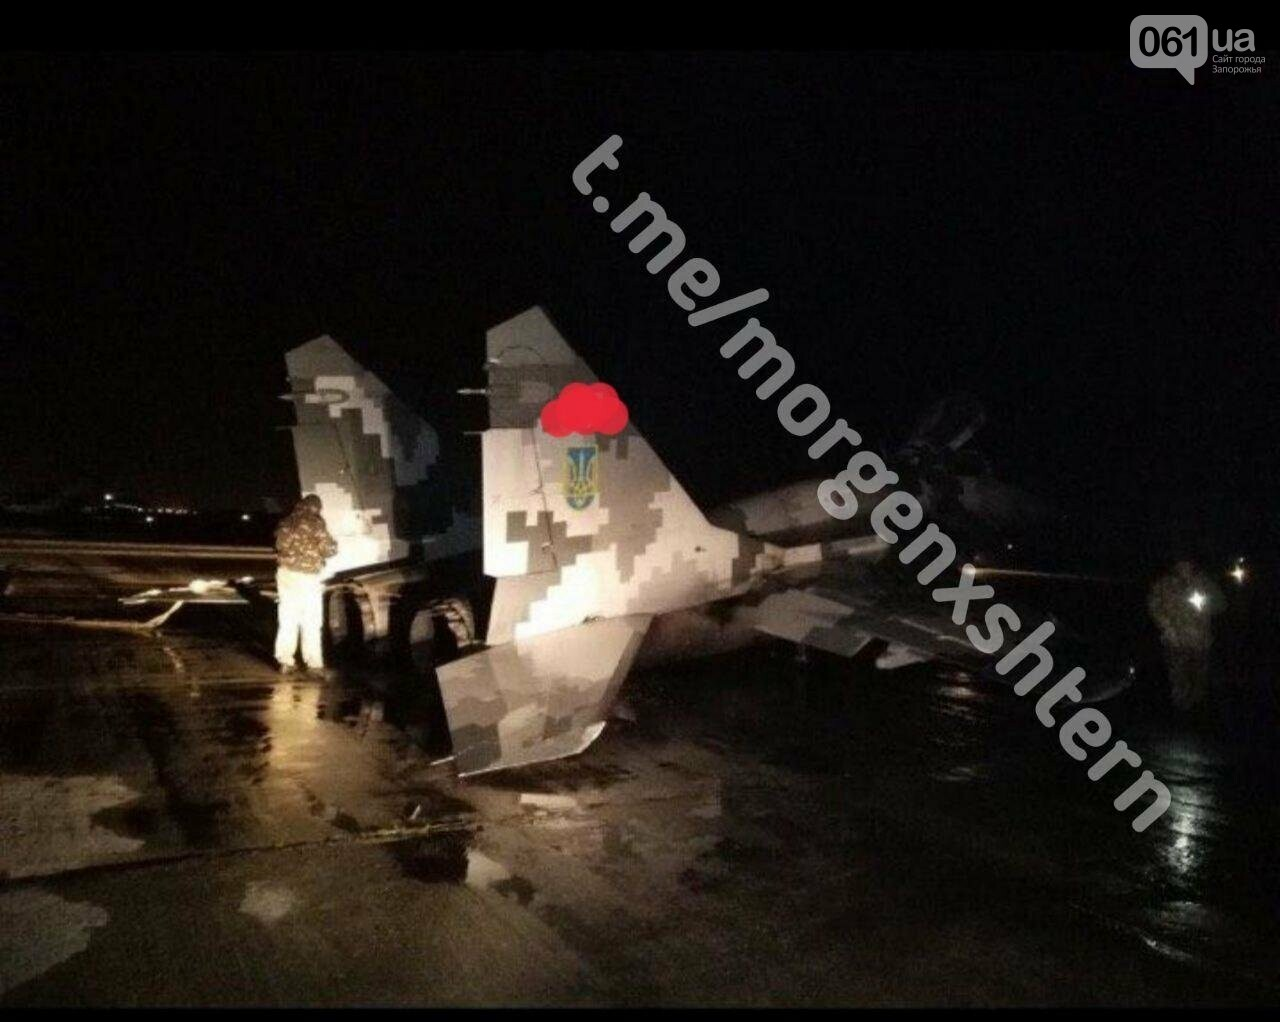 На аэродроме в Мелитополе совершил аварийную посадку истребитель МИГ-29, фото-1